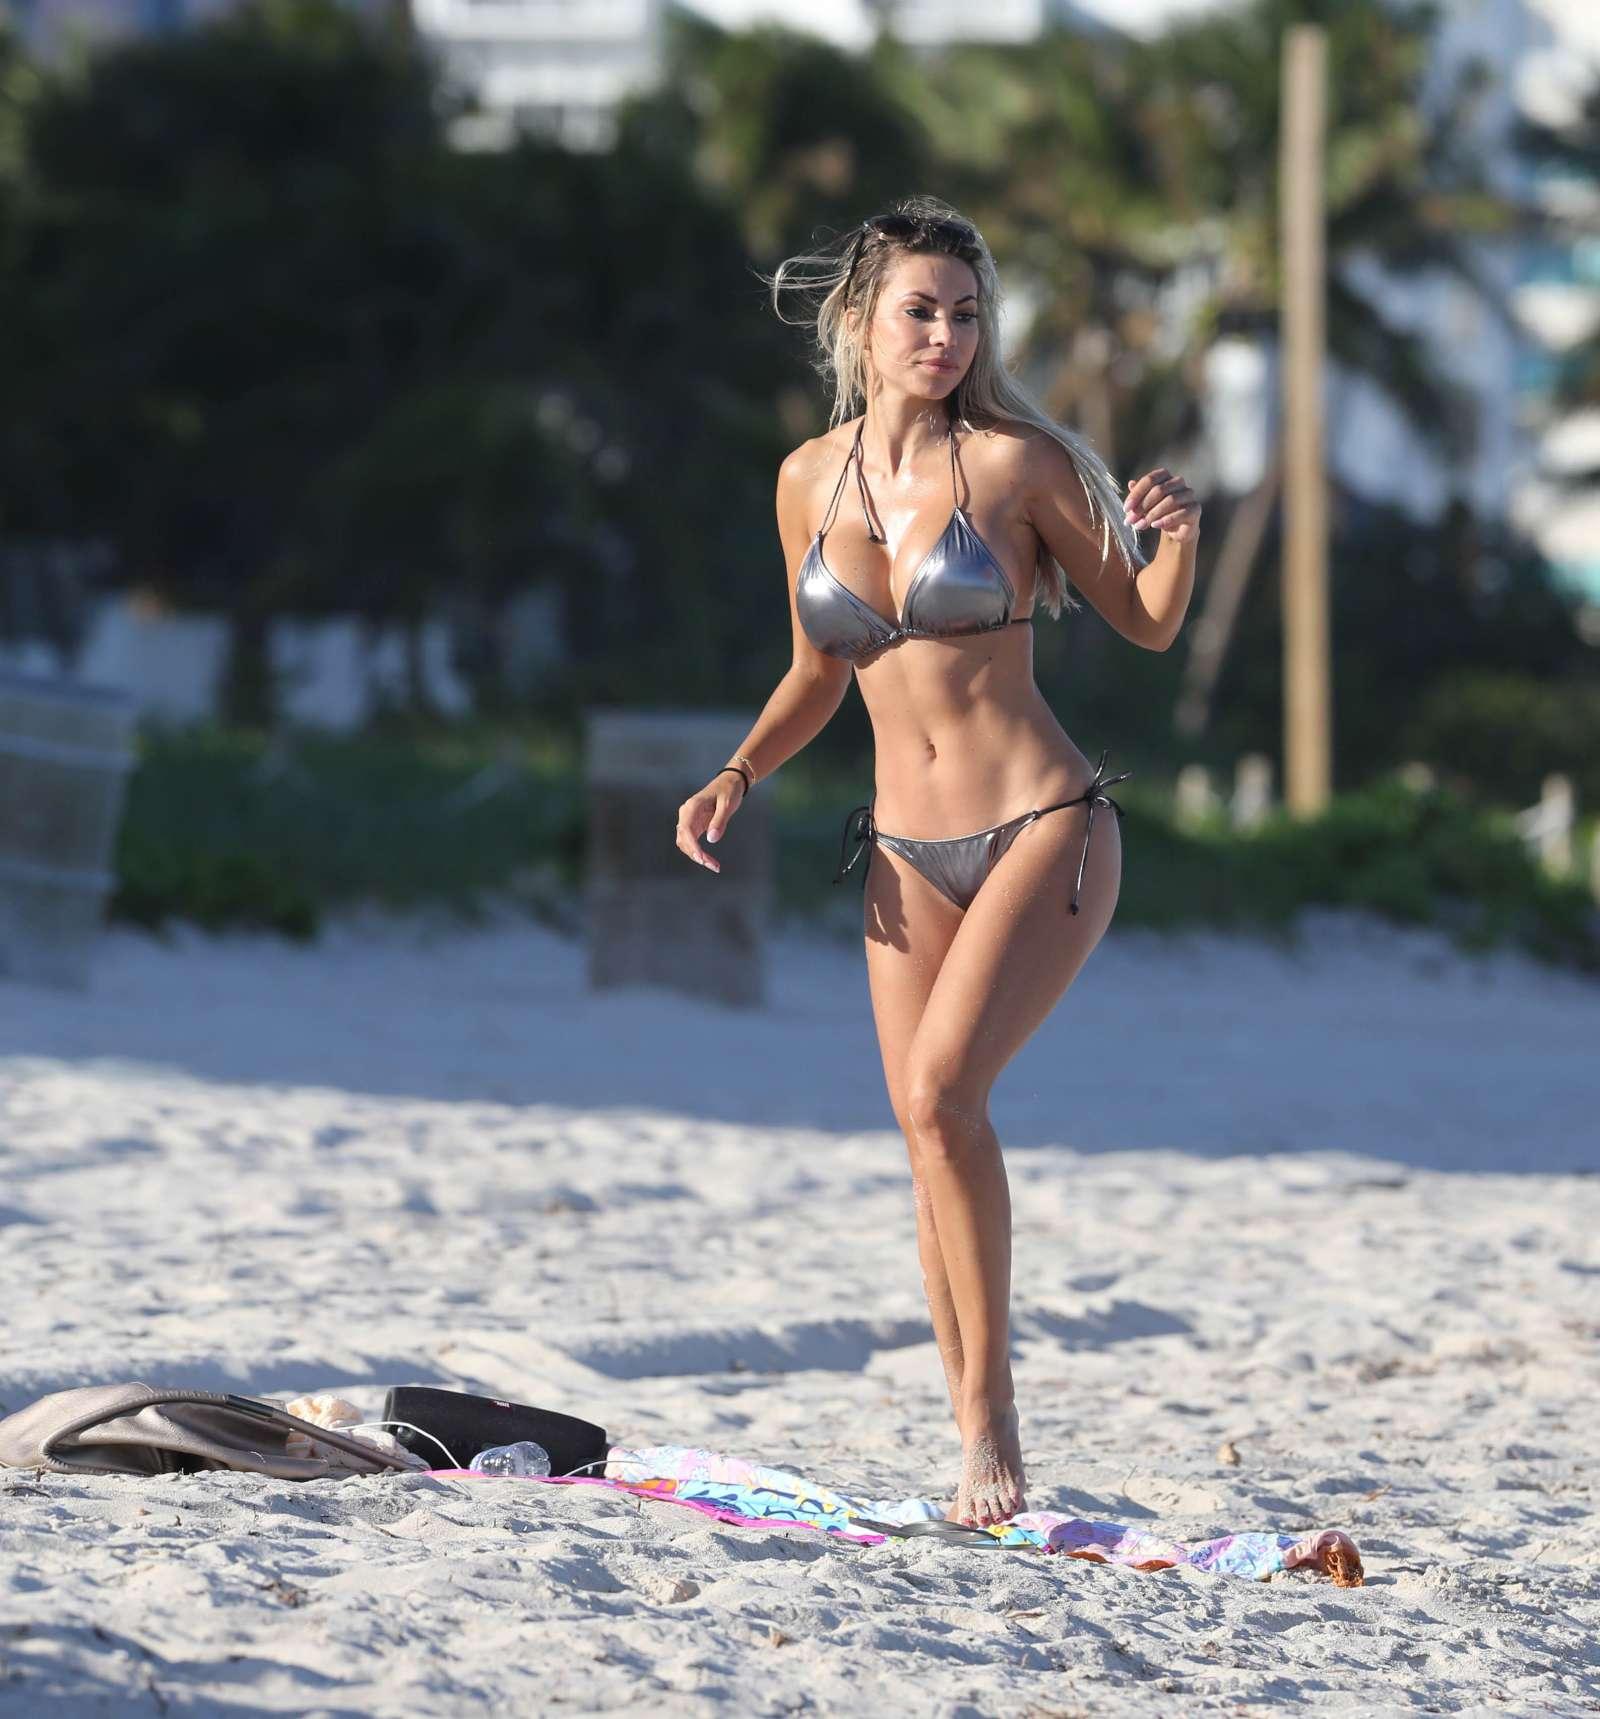 Maria Hering 2017 : Maria Hering in Bikini 2017 -06